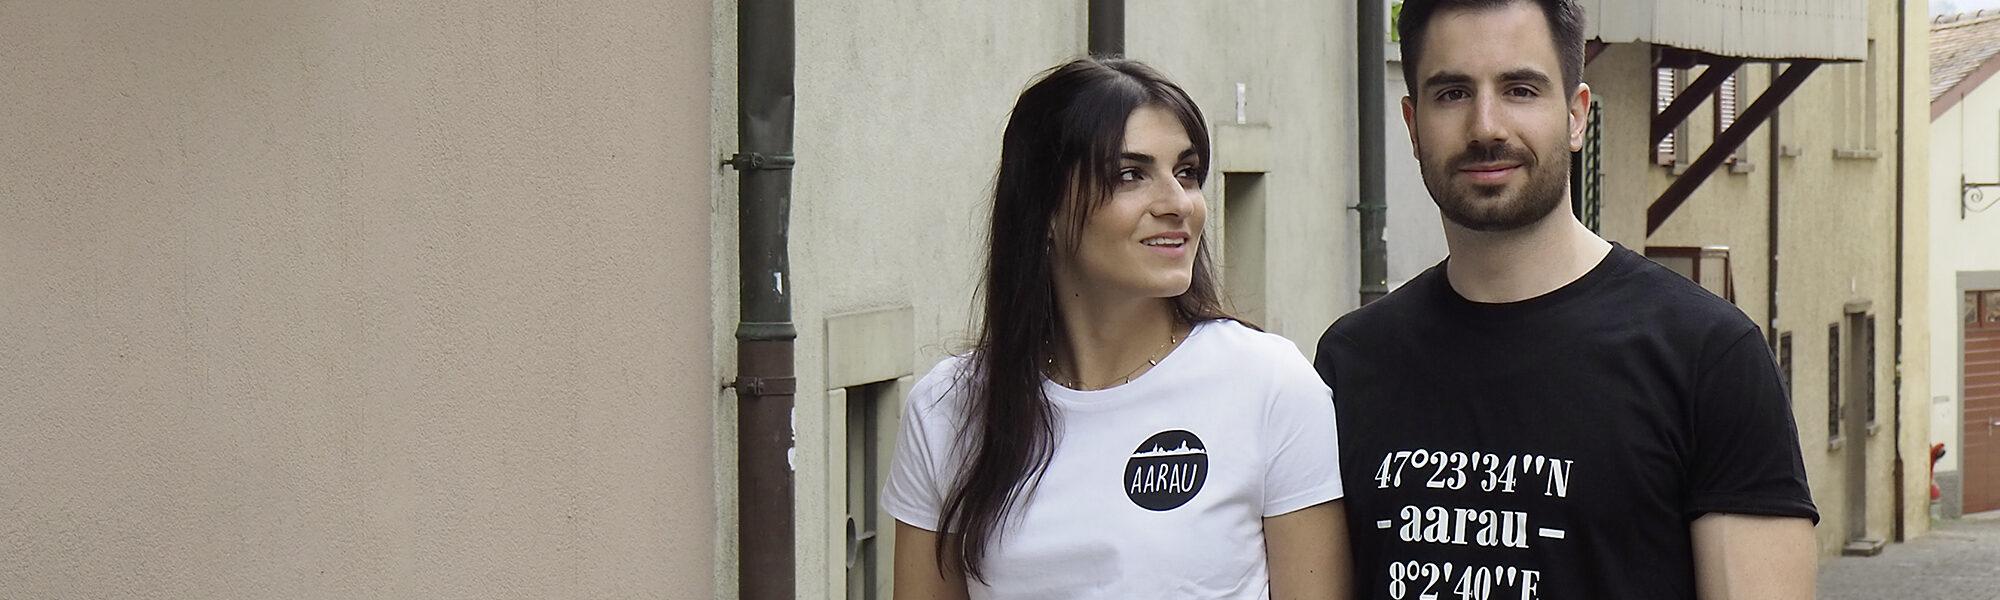 Aarauer T-Shirt mit Sujet